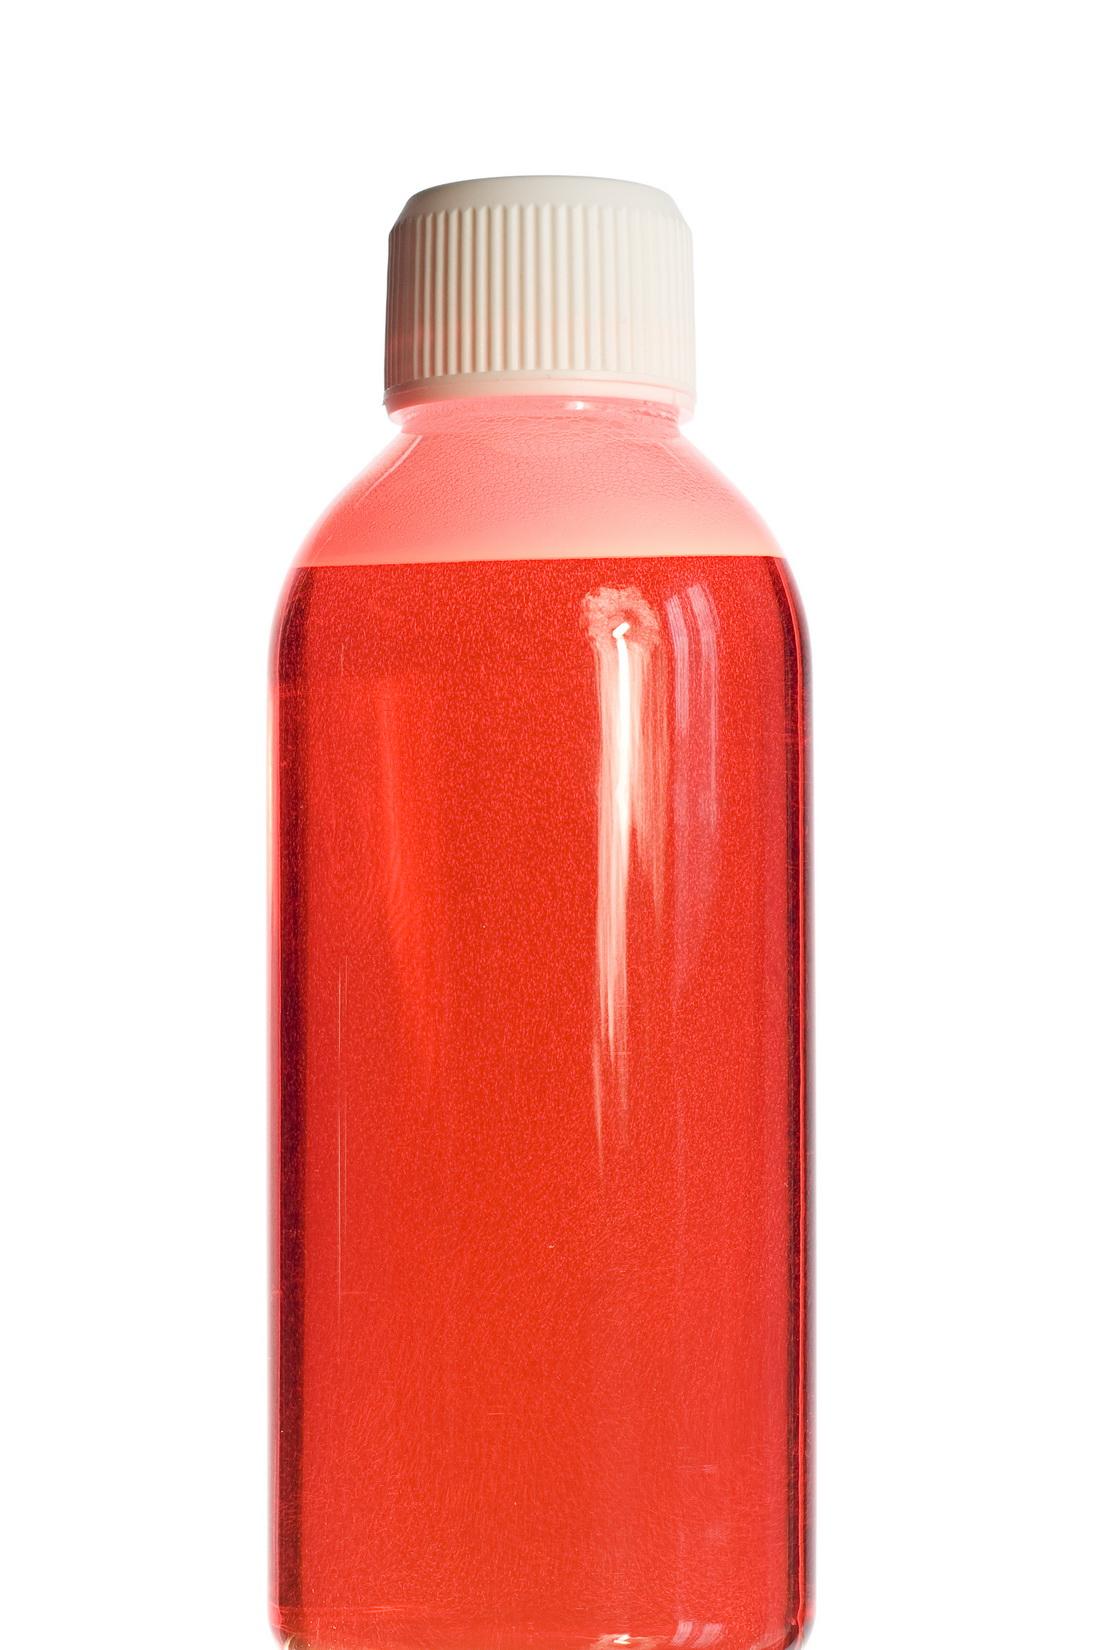 Plastic bottle photo